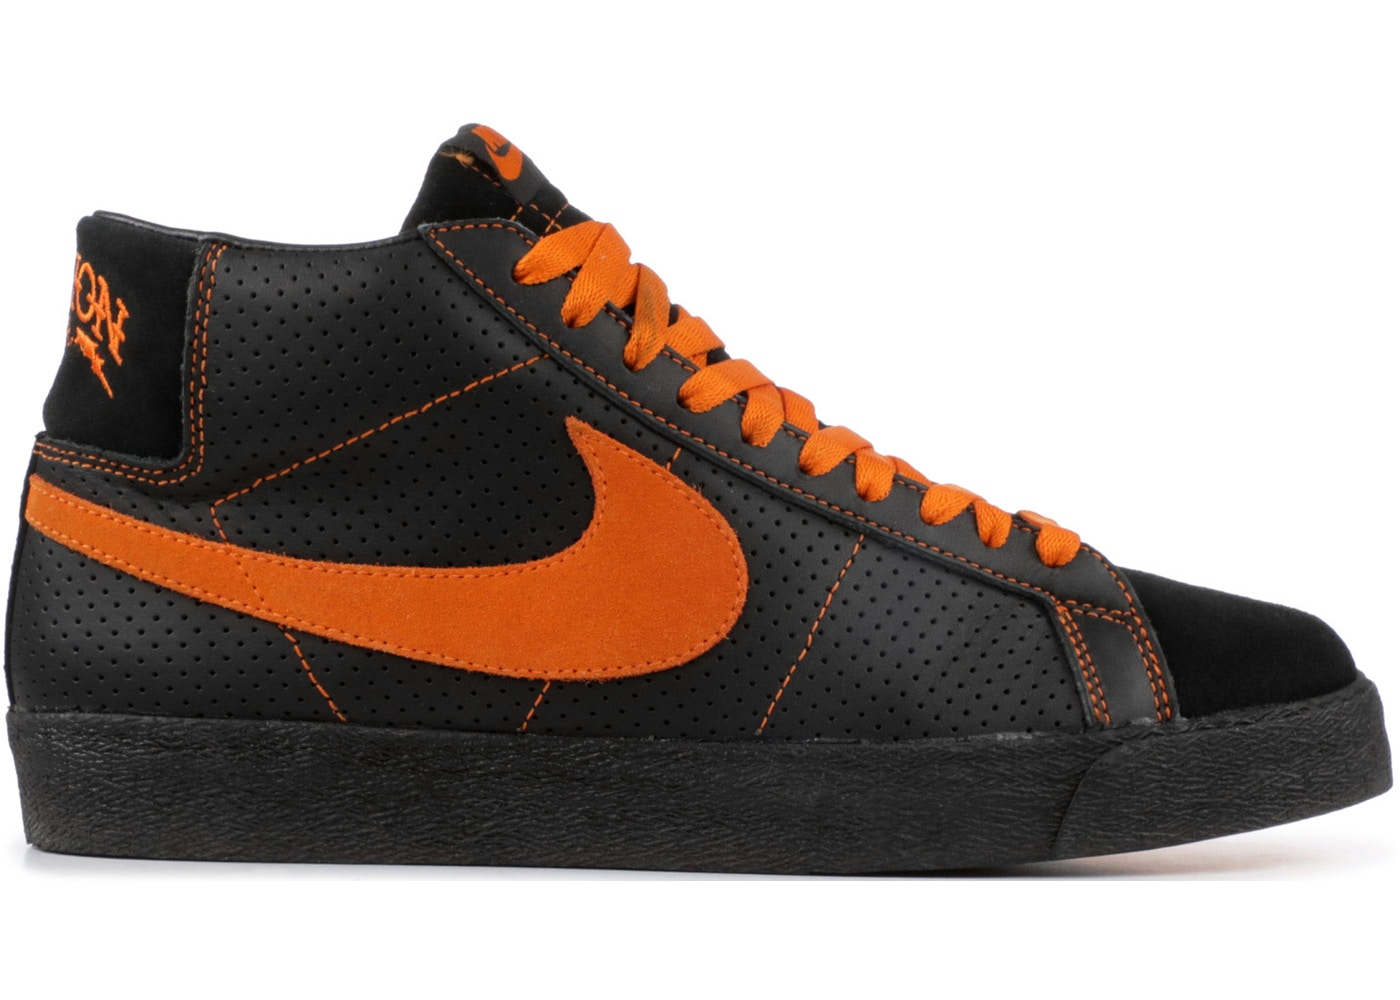 timeless design 0be51 ba075 Nike SB Blazer Mission